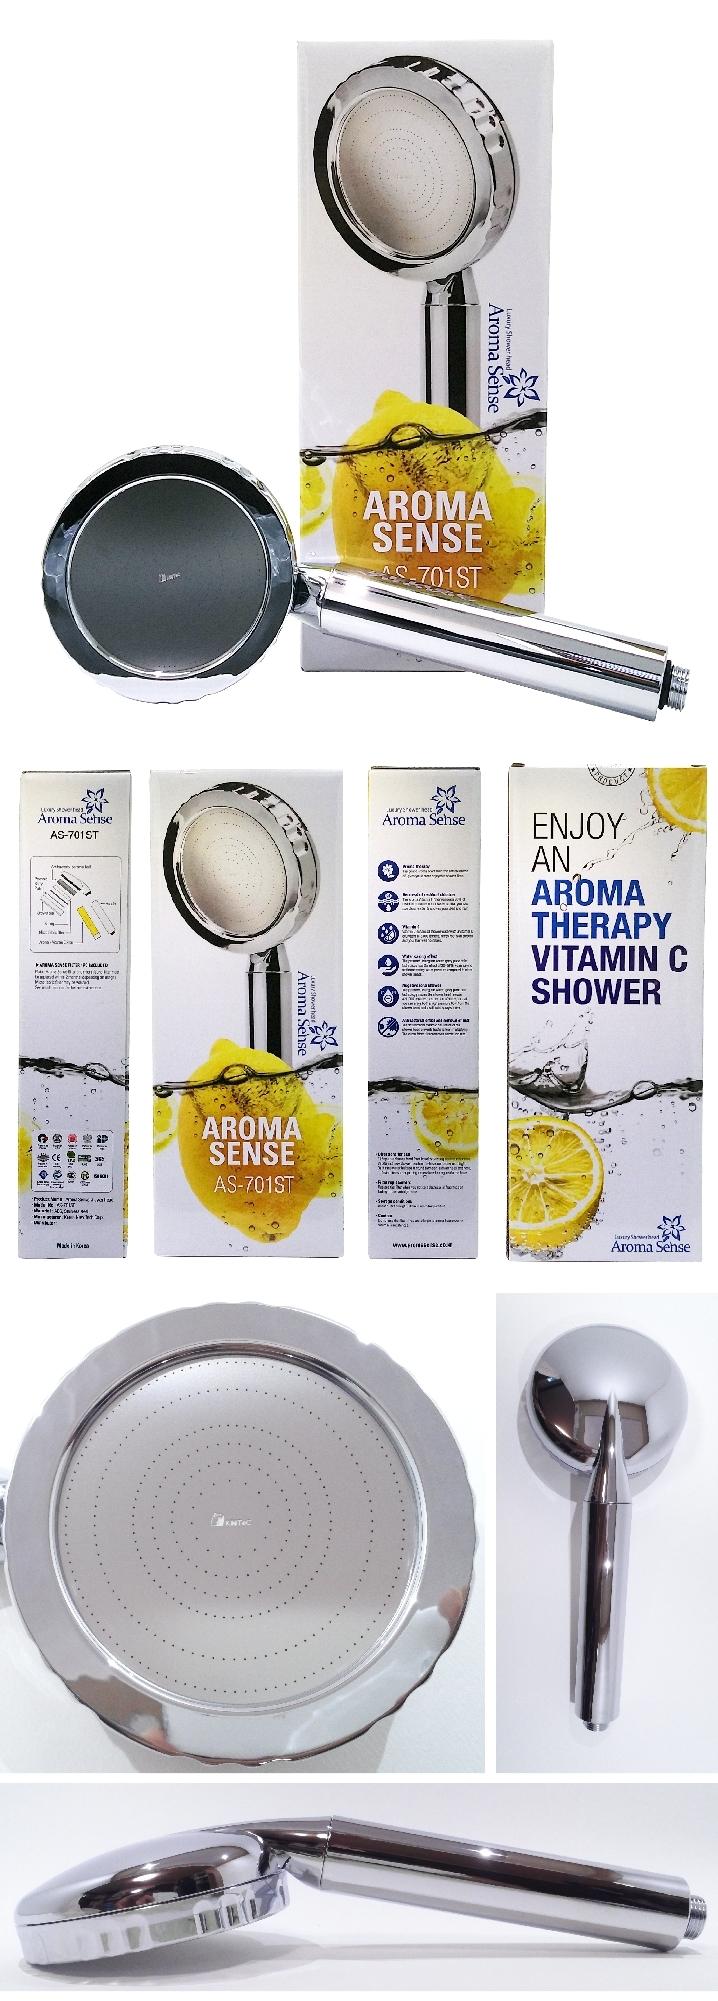 kntec aroma sense vitamin c water saving super jet as 701st chrome shower head ebay. Black Bedroom Furniture Sets. Home Design Ideas